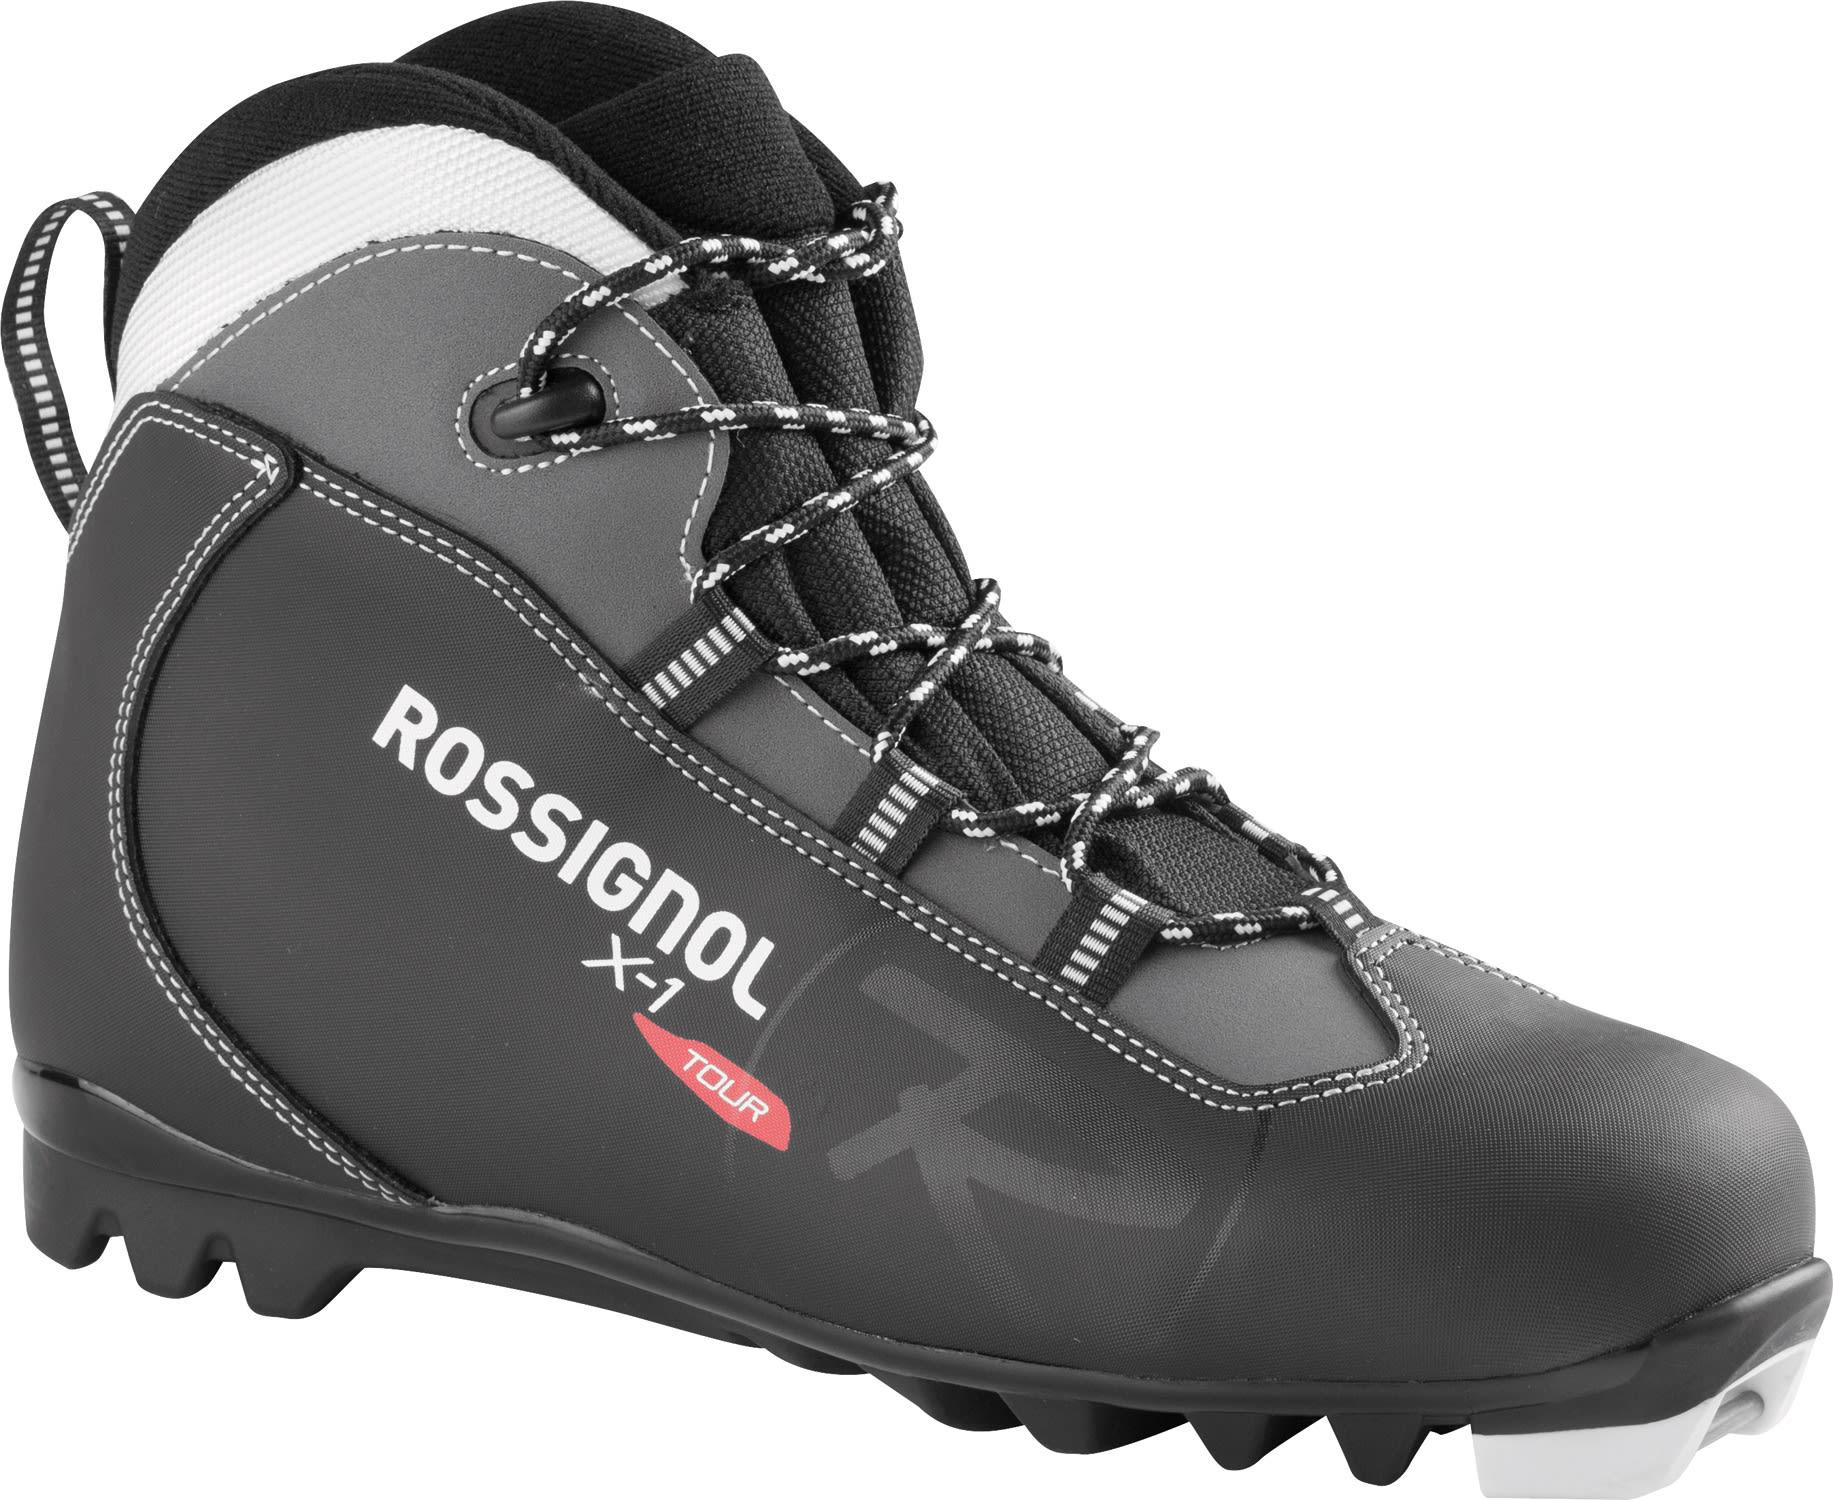 Rossignol X 1 Xc Ski Boots